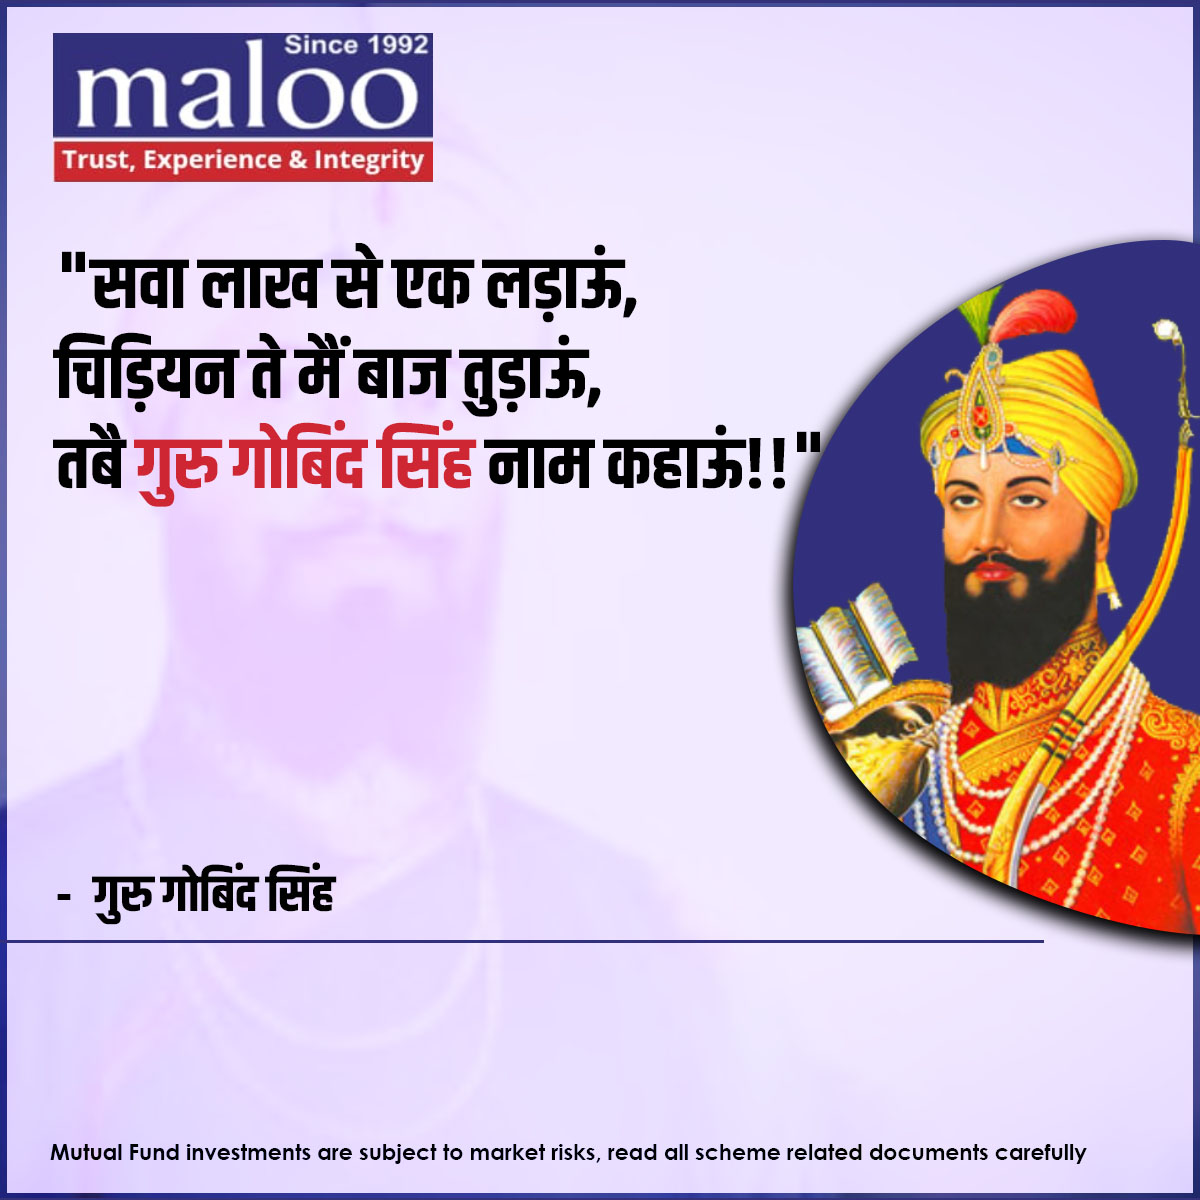 Happy Guru Gobind Singh Jayanti  #waheguru #gurugobindsinghji #ji #khalsa #gurunanakdevji #gurbani #gurugranthsahibji #waheguruji #sikh #satnamwaheguru #sikhism #punjab #amritsar #singh #wmk #goldentemple #sikhi #fateh #gurbaniquotes #ka #sardar #gururamdasji